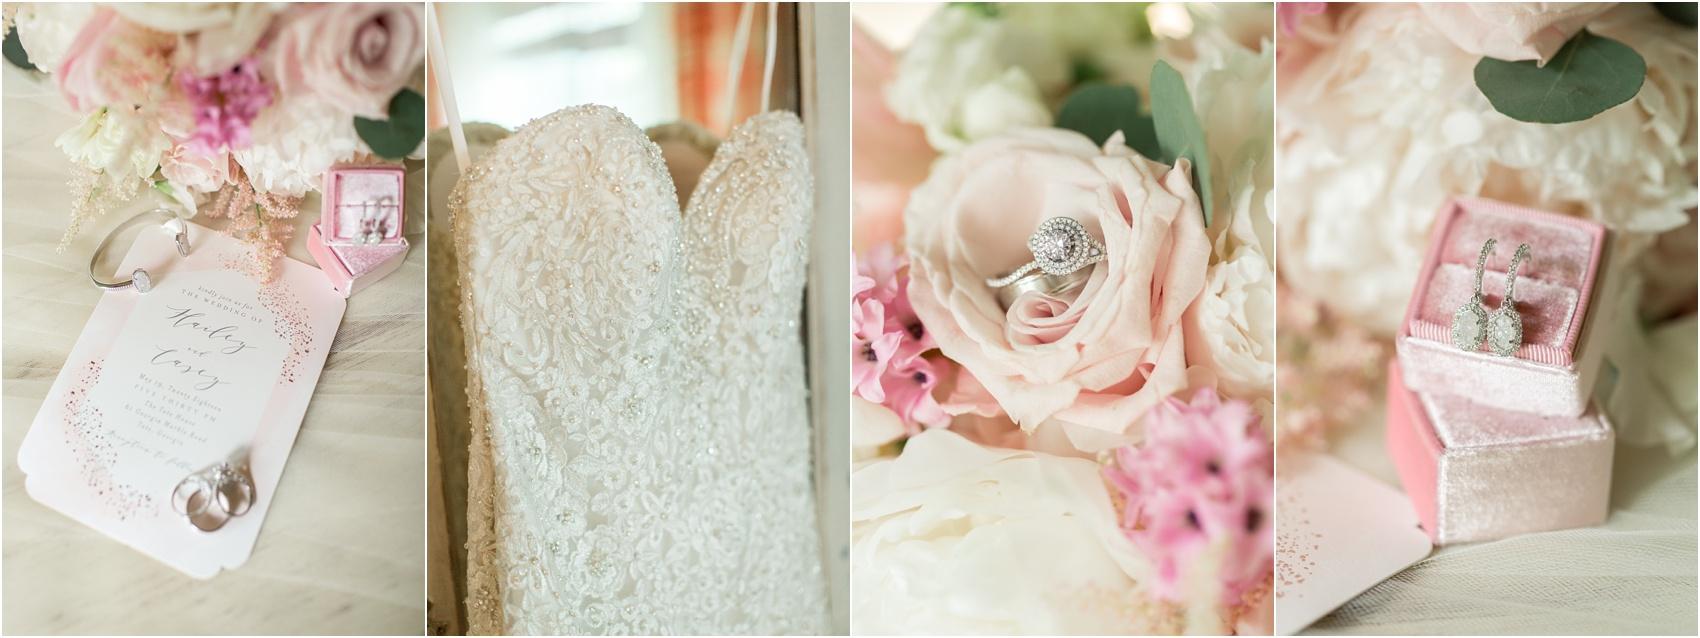 Savannah Eve Photography- Nutt Wedding- Blog-8.jpg